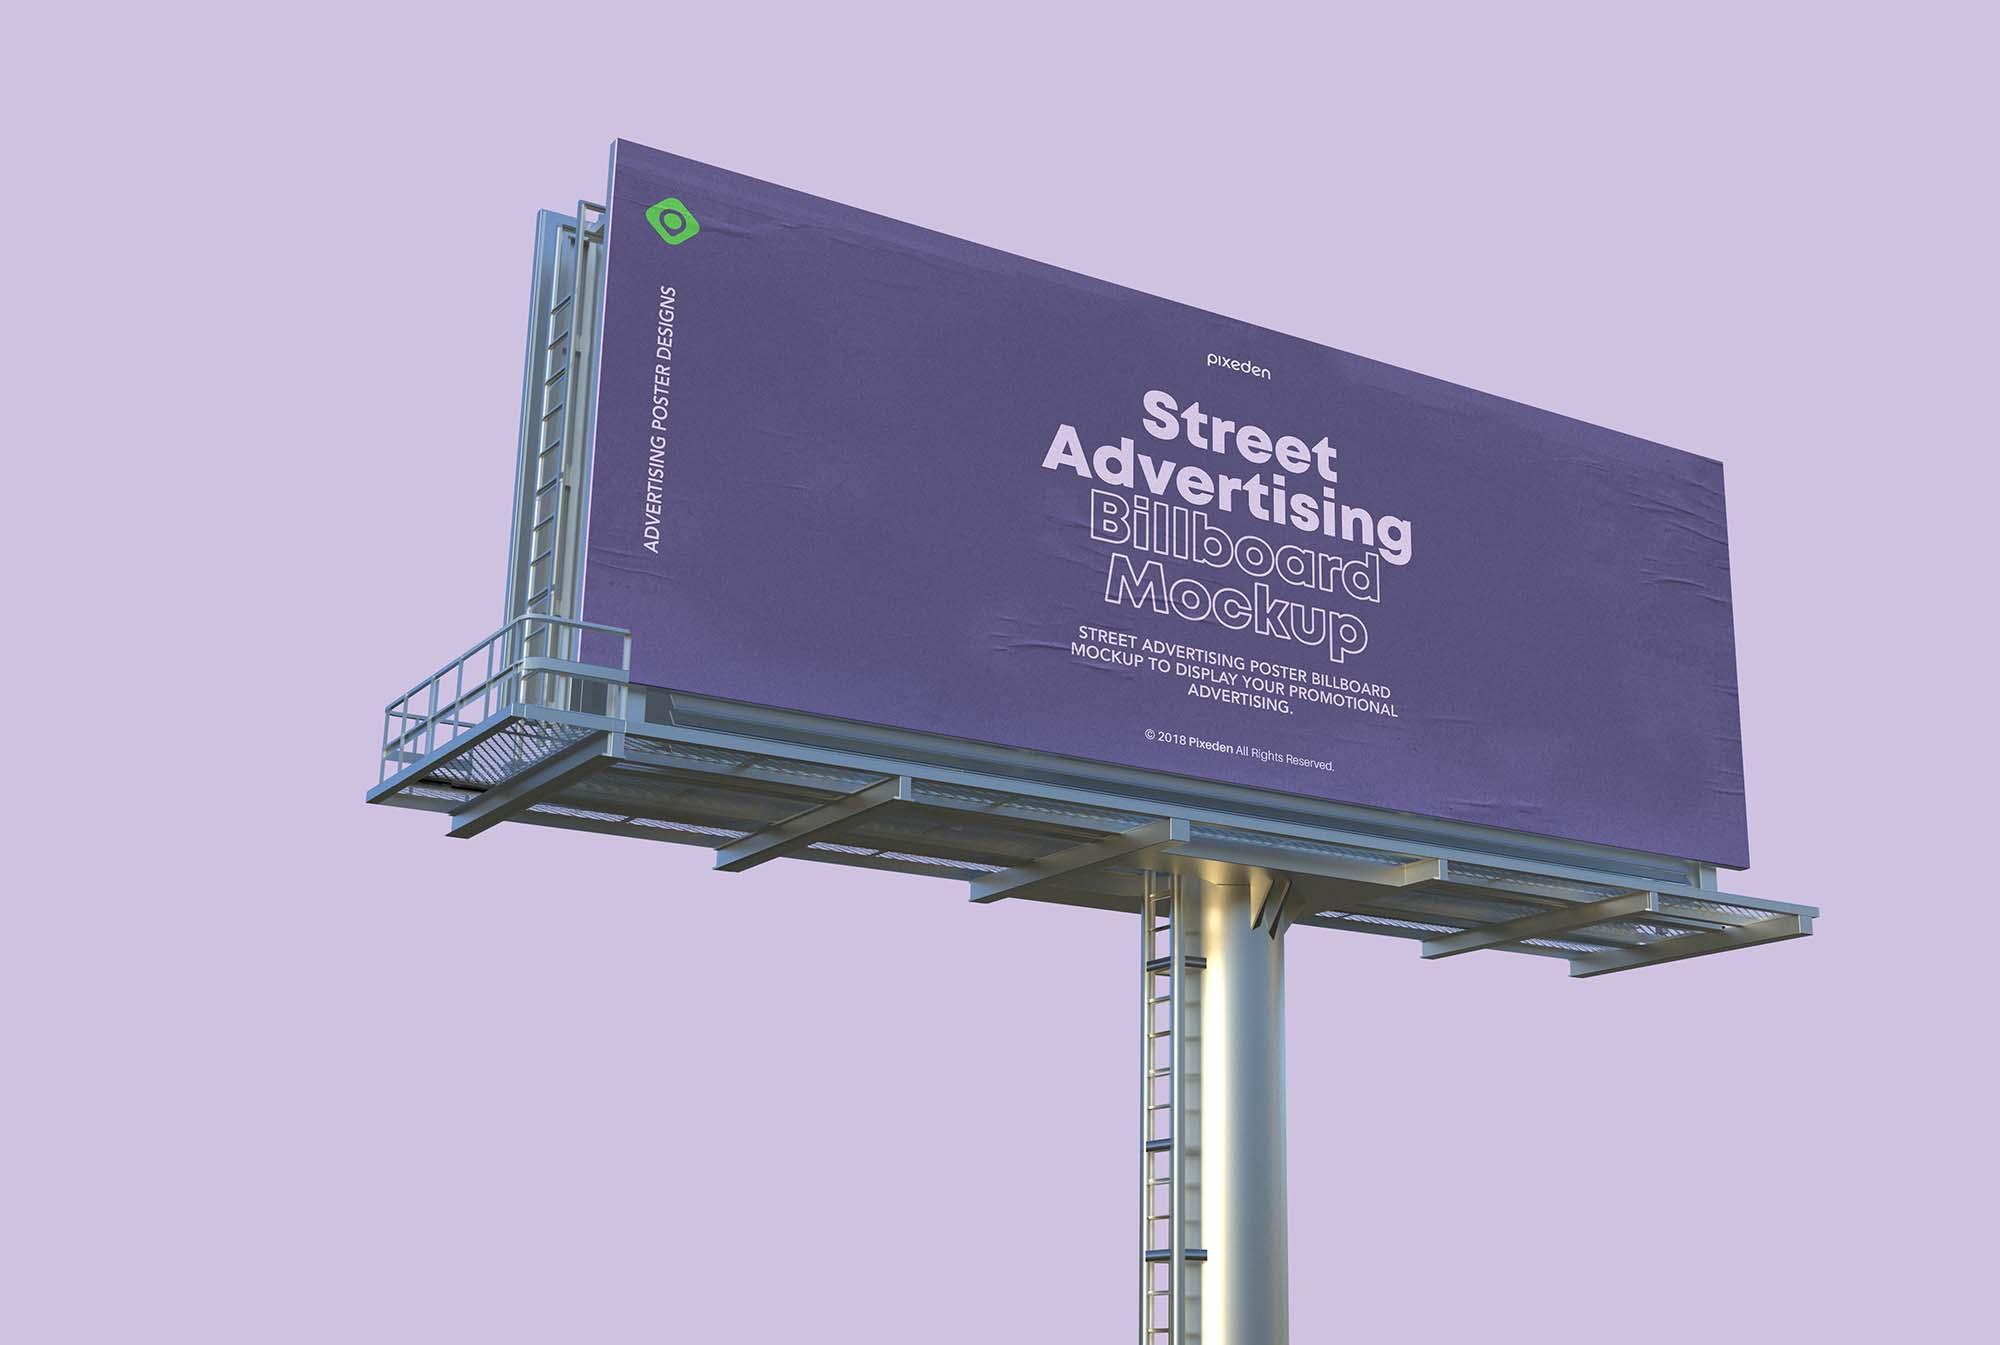 Street Advertising Billboard Mockup 2